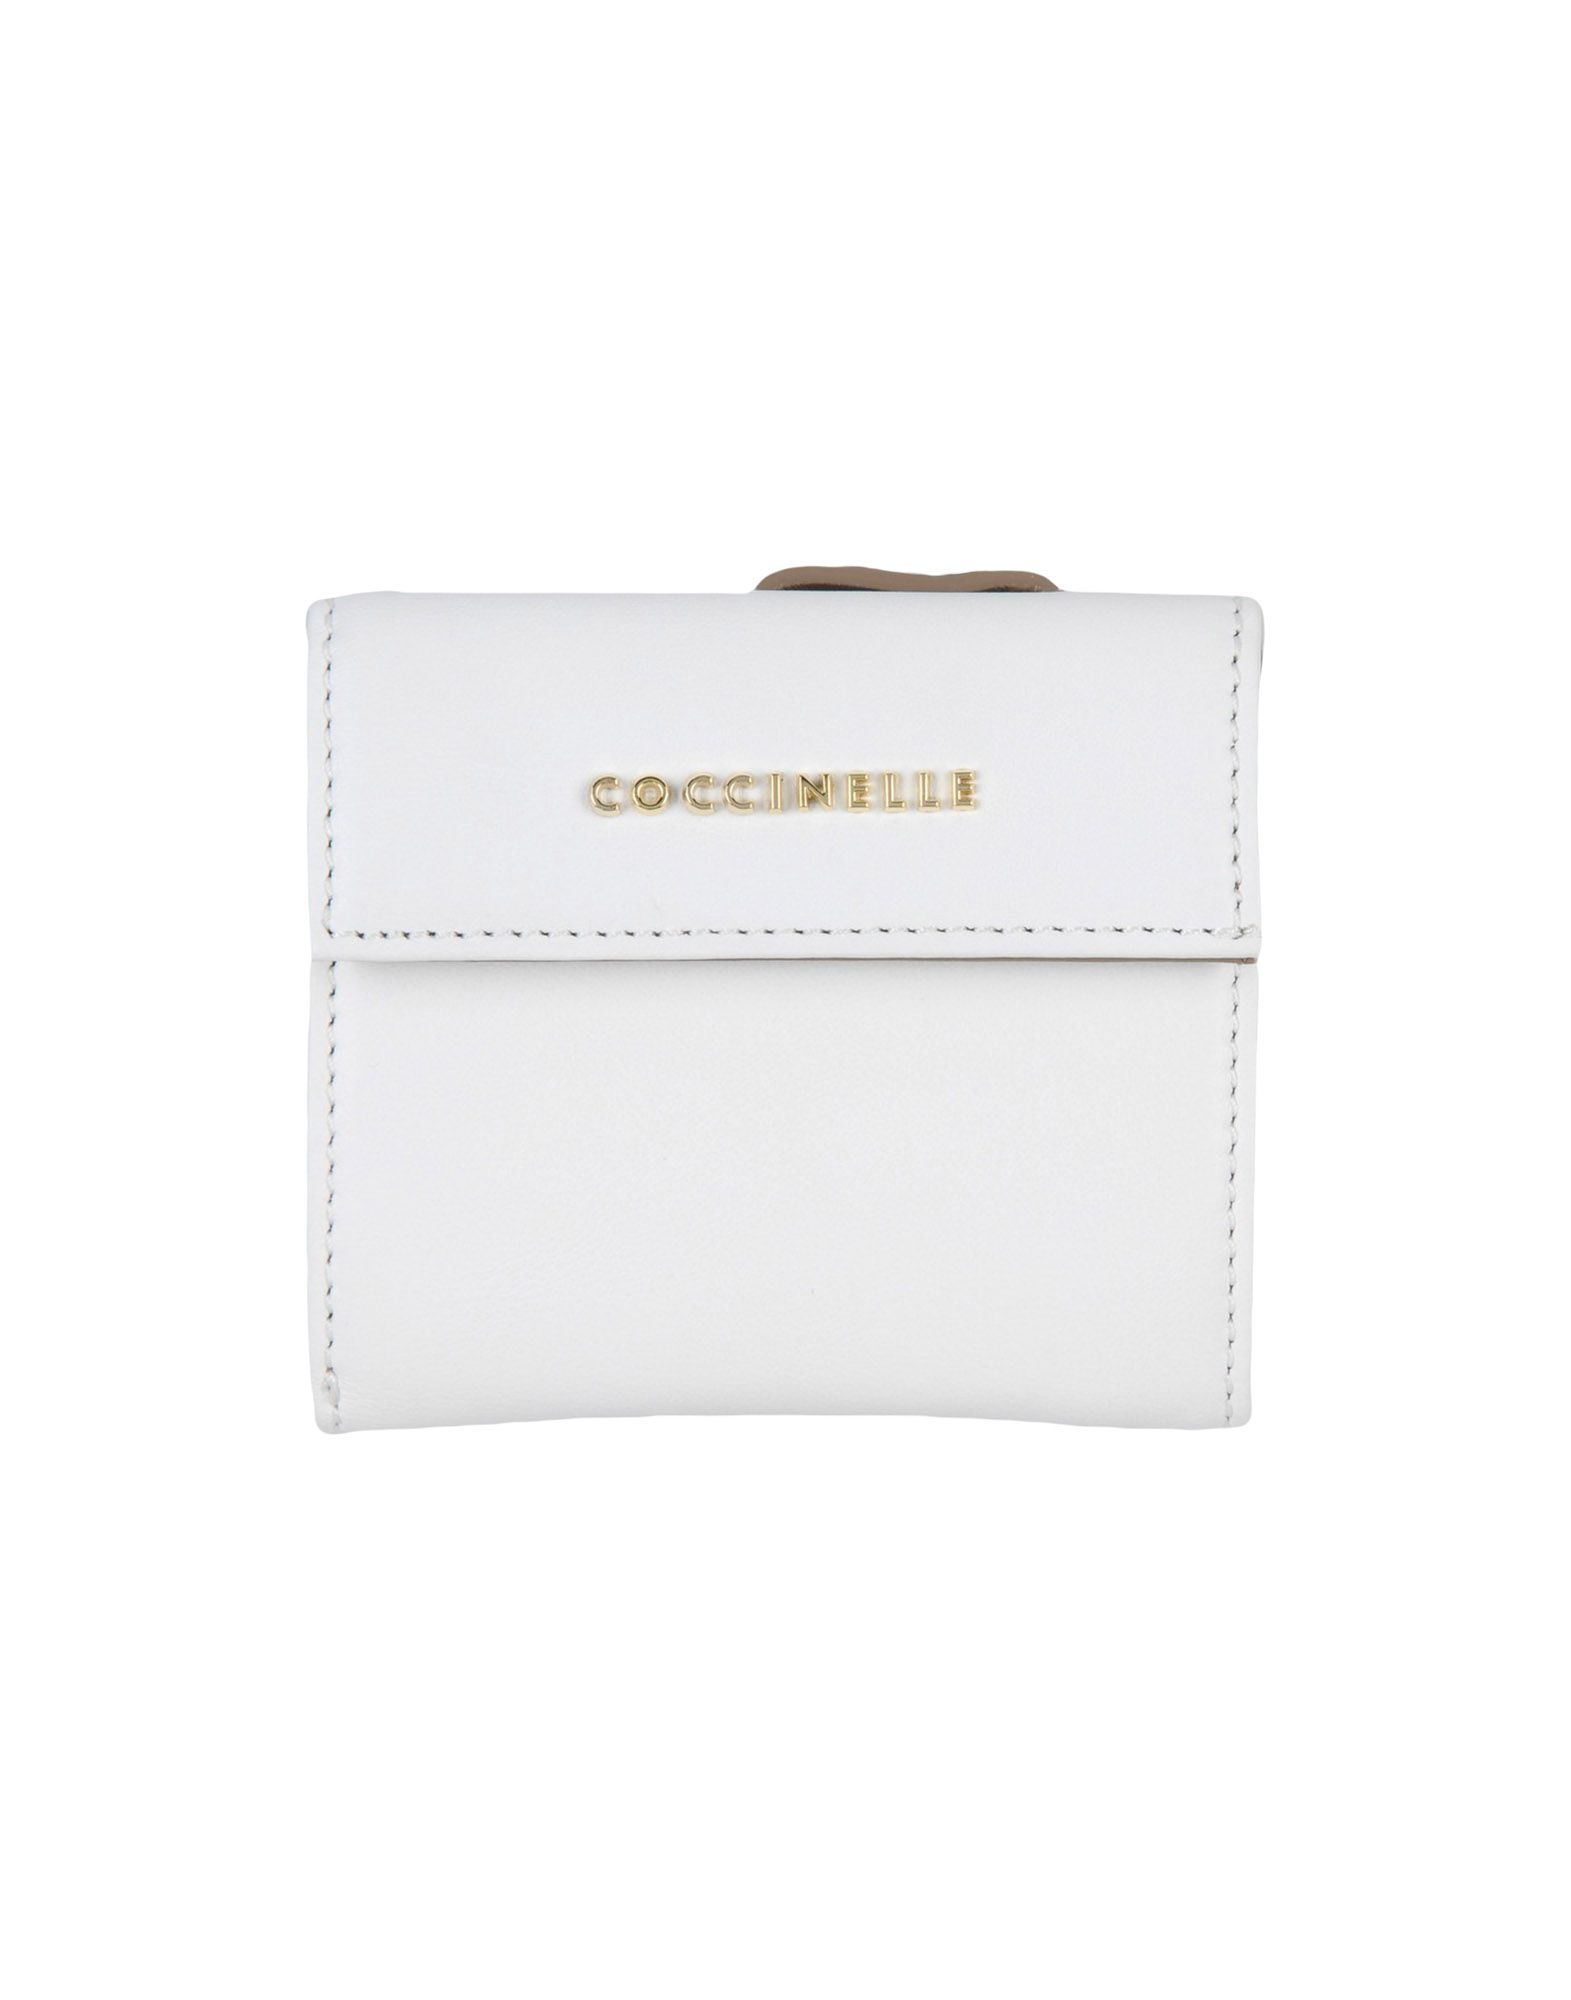 COCCINELLE Бумажник coccinelle c1 ya0 12 01 01 001